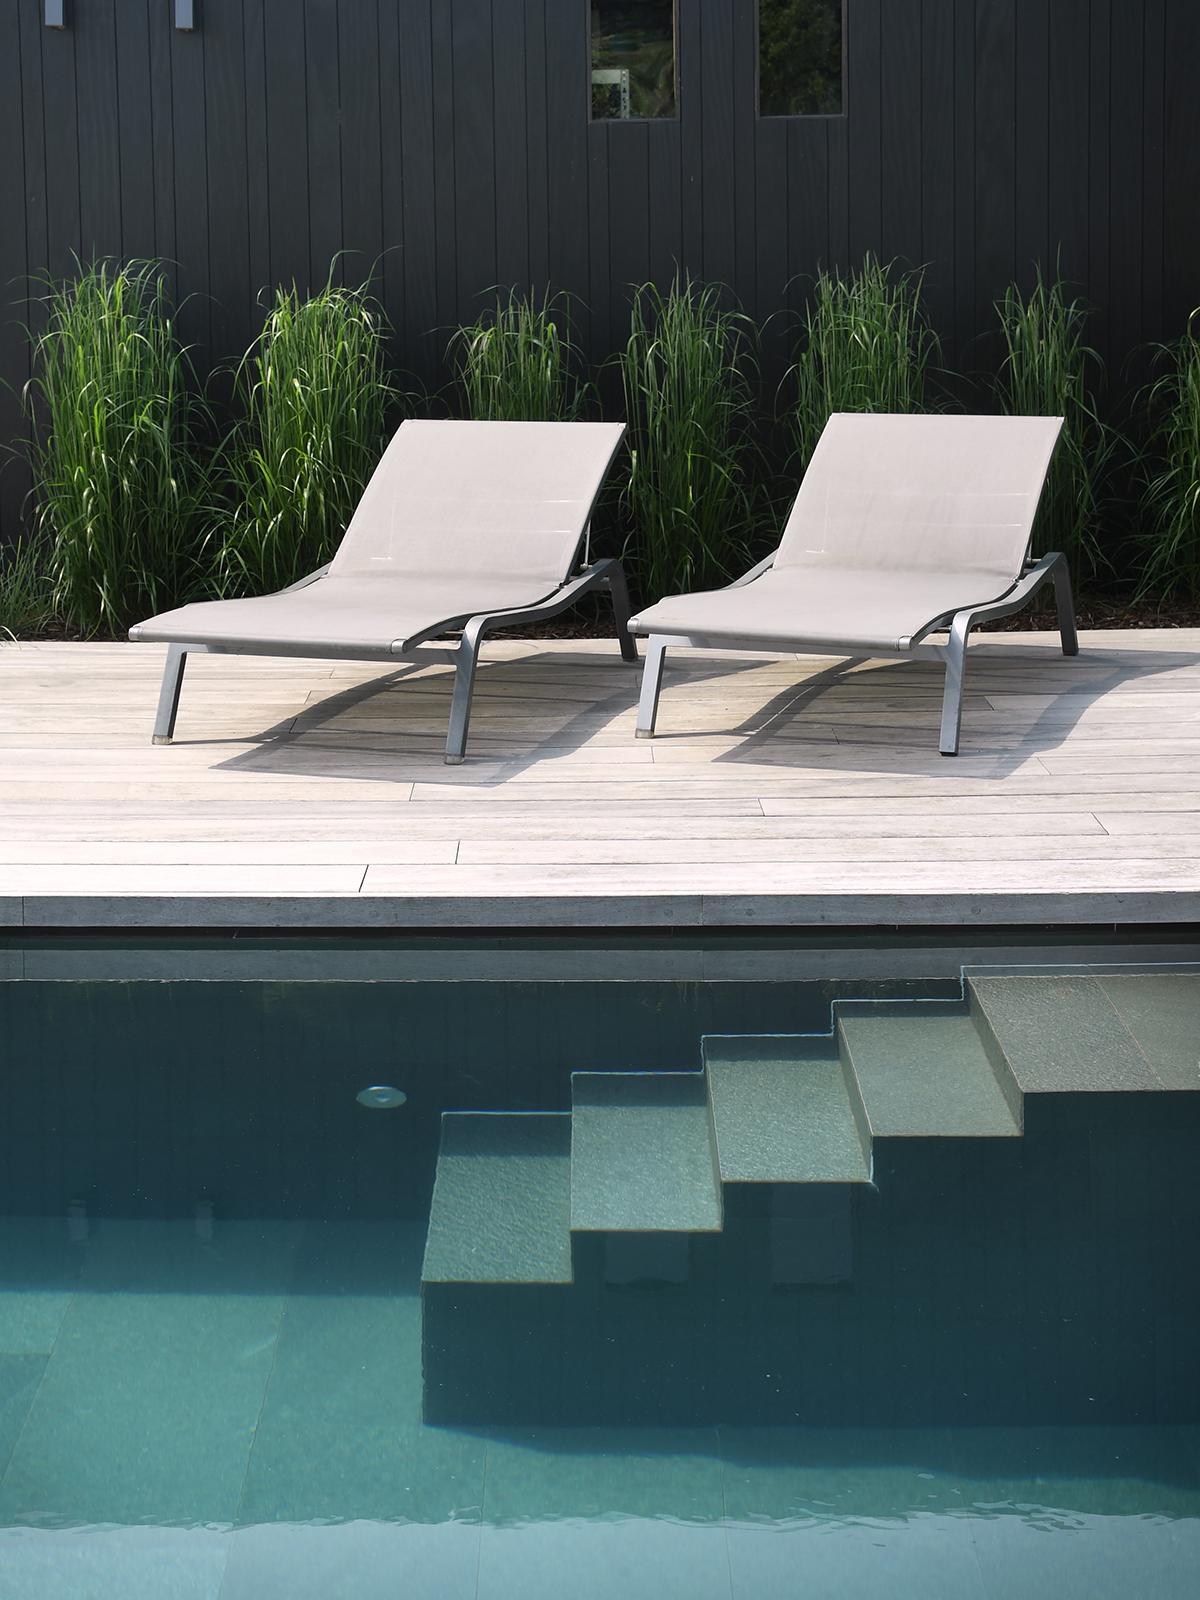 Strakke tuin, Willy Naessens, zwembad, buitenzwembad, tuin, The Art Of Living